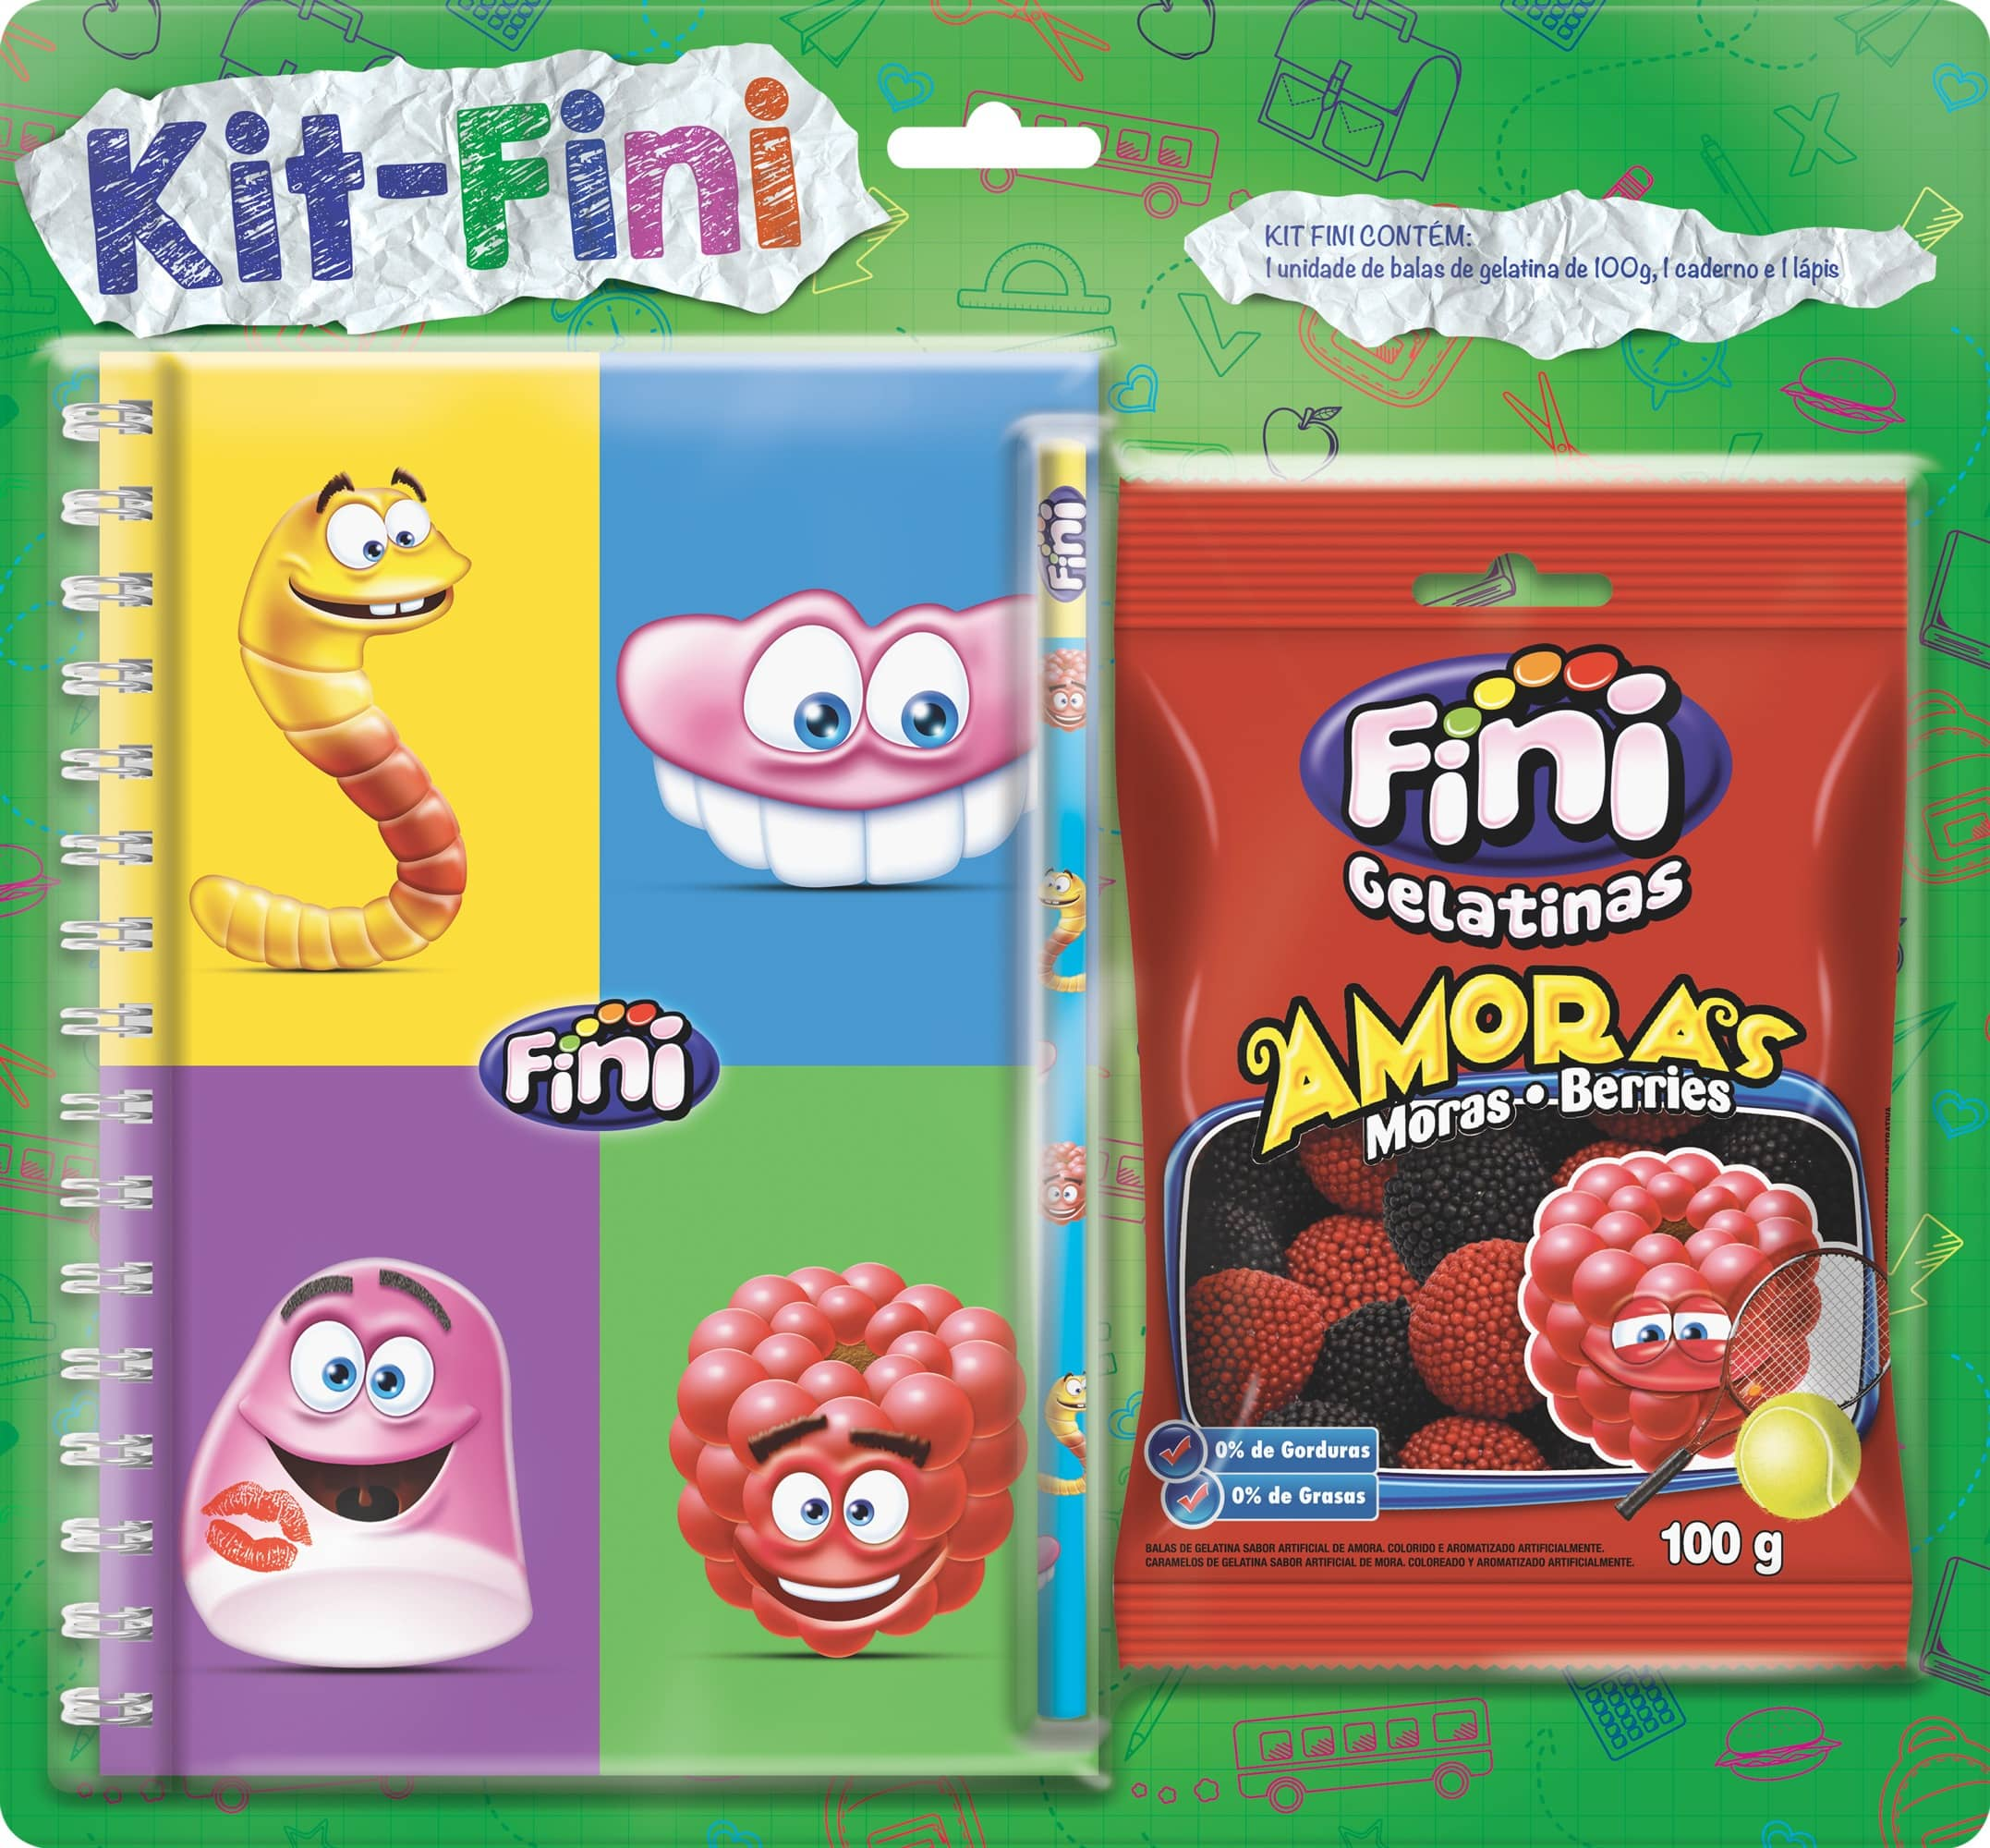 Mockup-kit-fini-amora